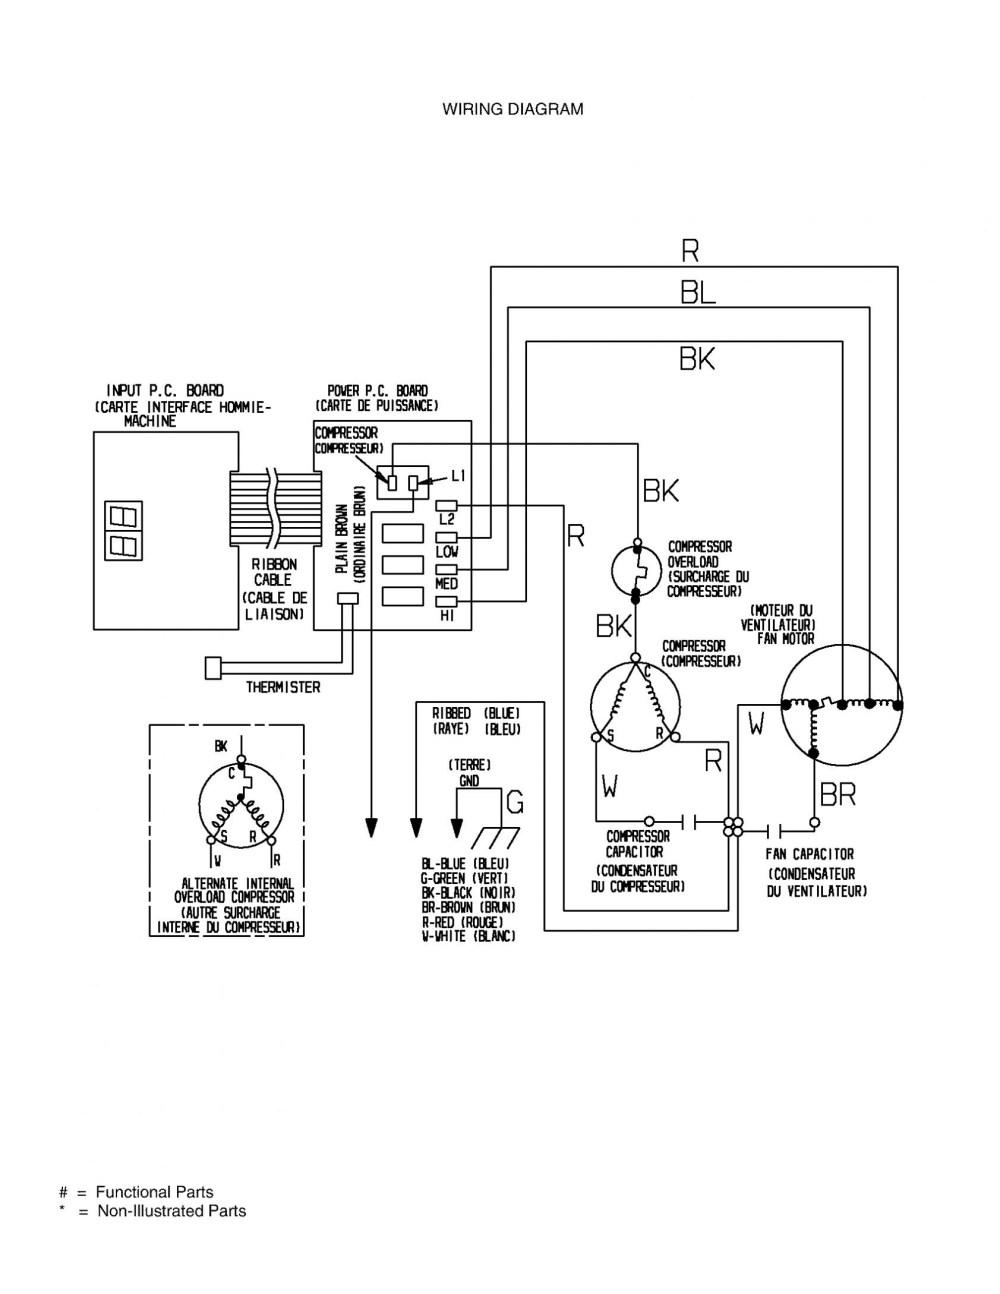 medium resolution of lance truck camper wiring diagram camper ac wiring wiring diagram of lance truck camper wiring diagram